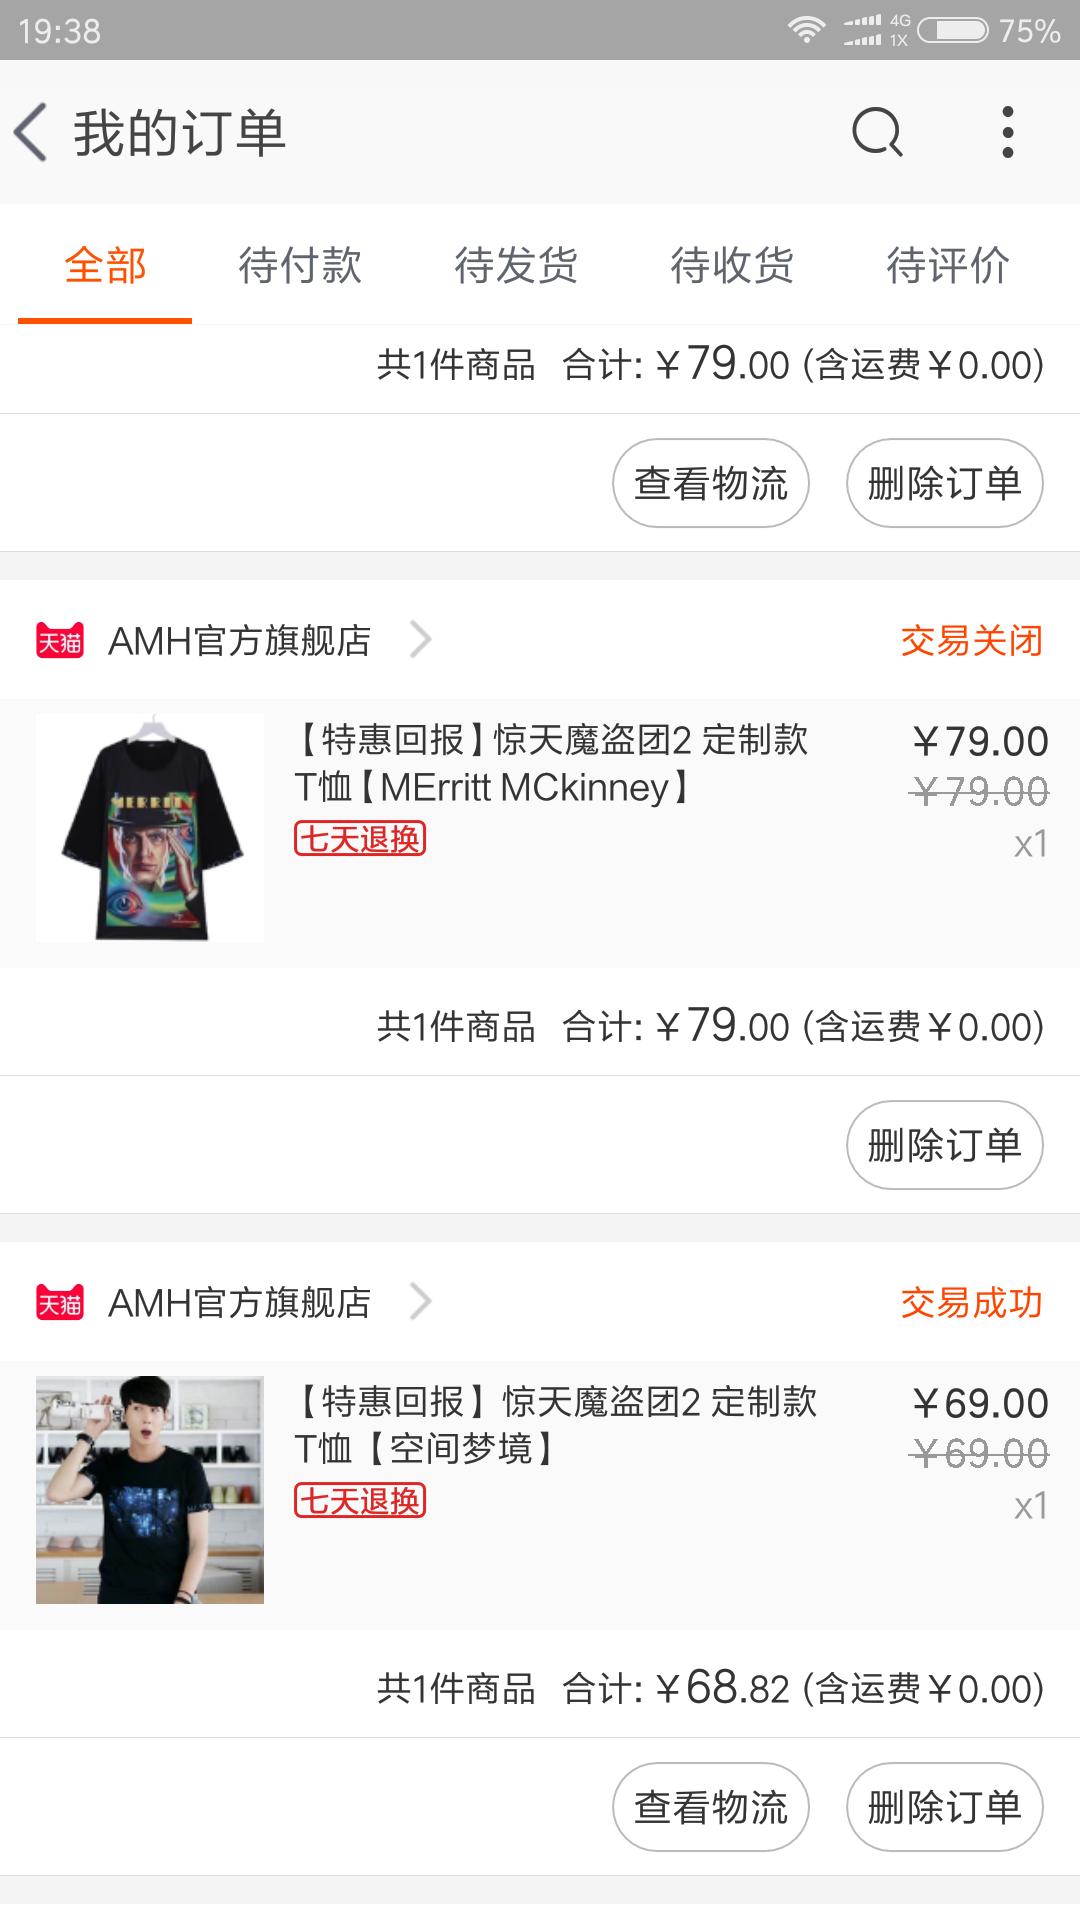 Screenshot_2017-08-22-19-38-54-384_com.taobao.taobao.png